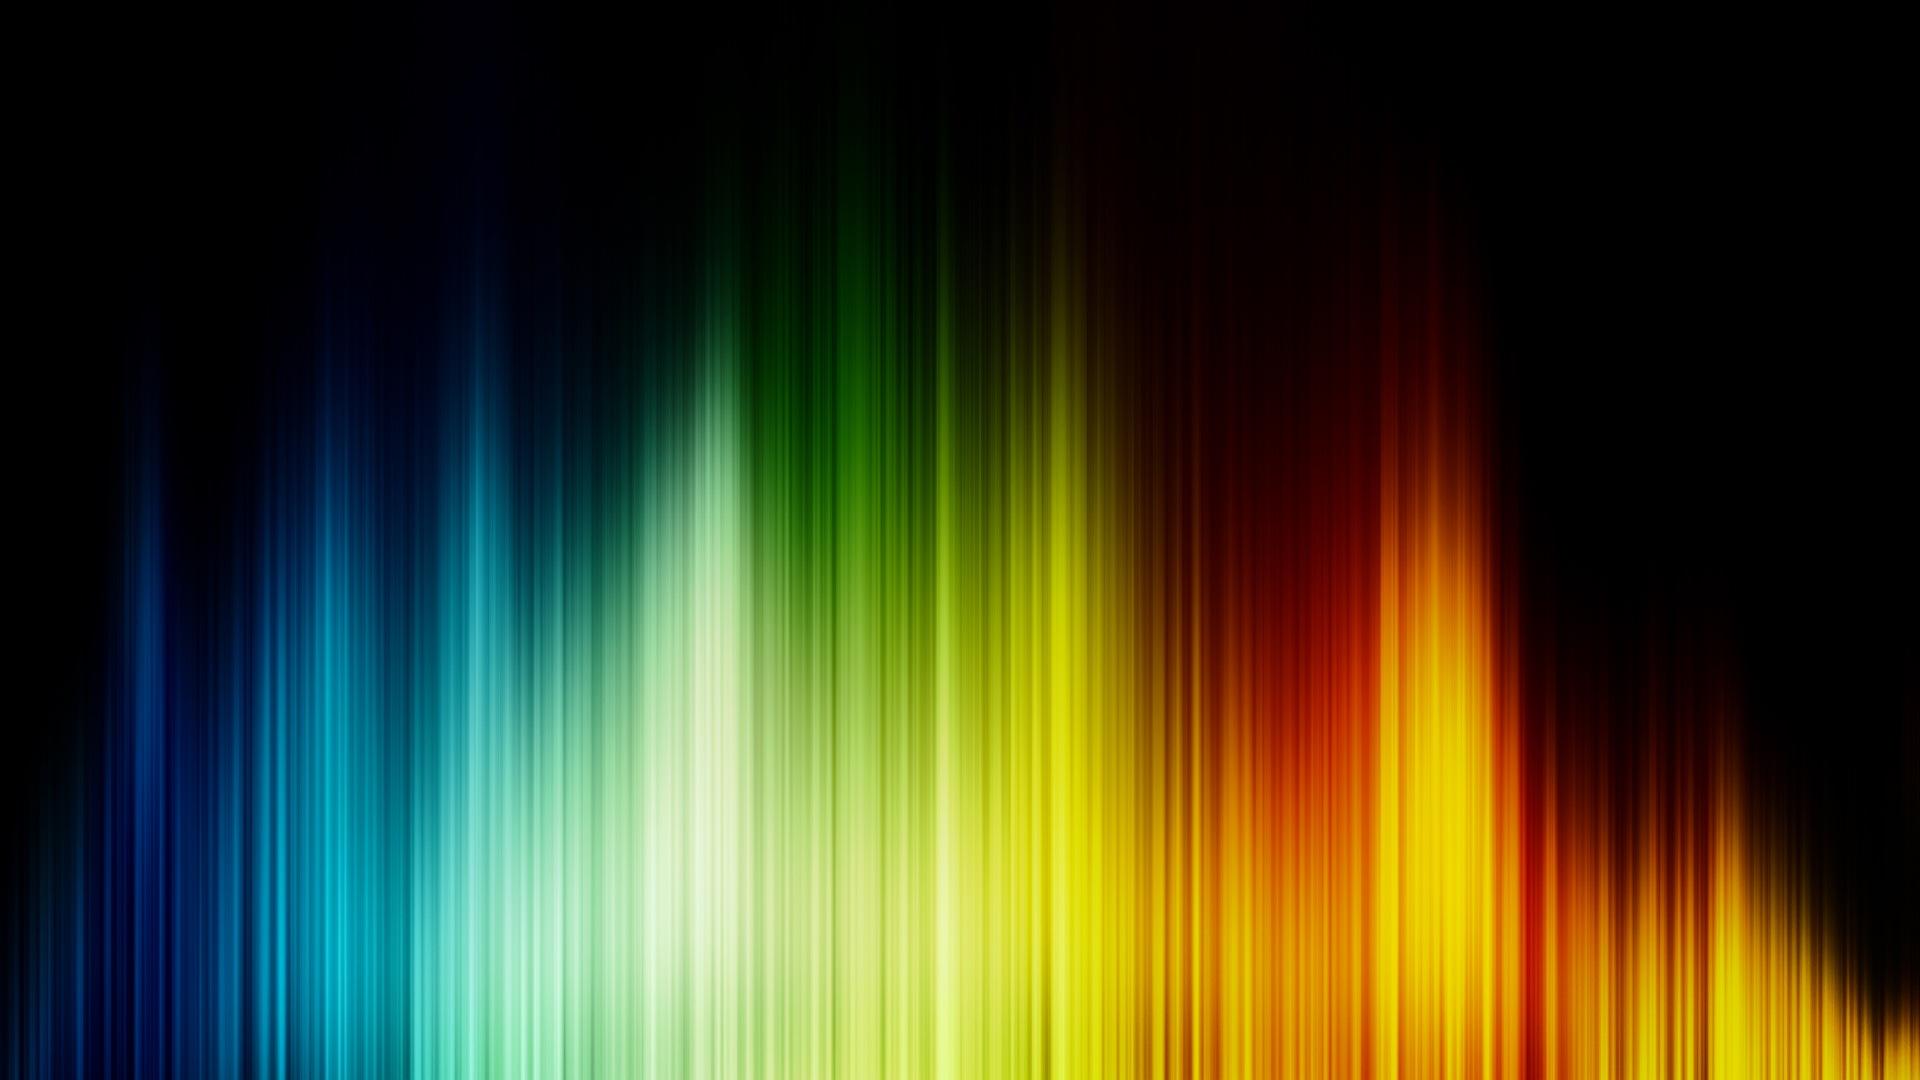 rainbow wave length wallpapers - photo #32